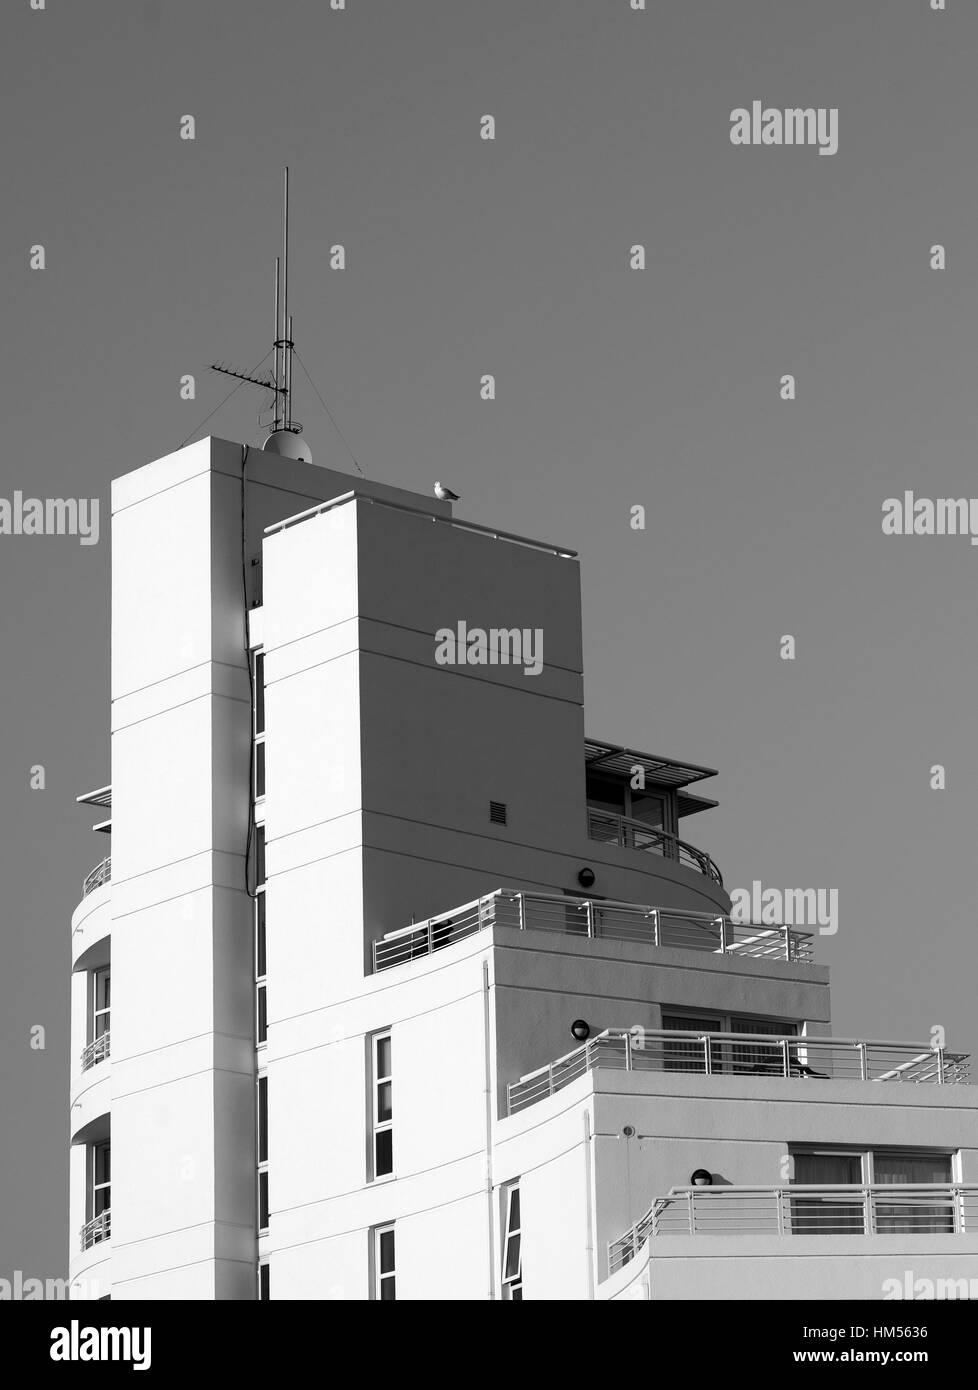 Architecture, docklands, London,UK - Stock Image